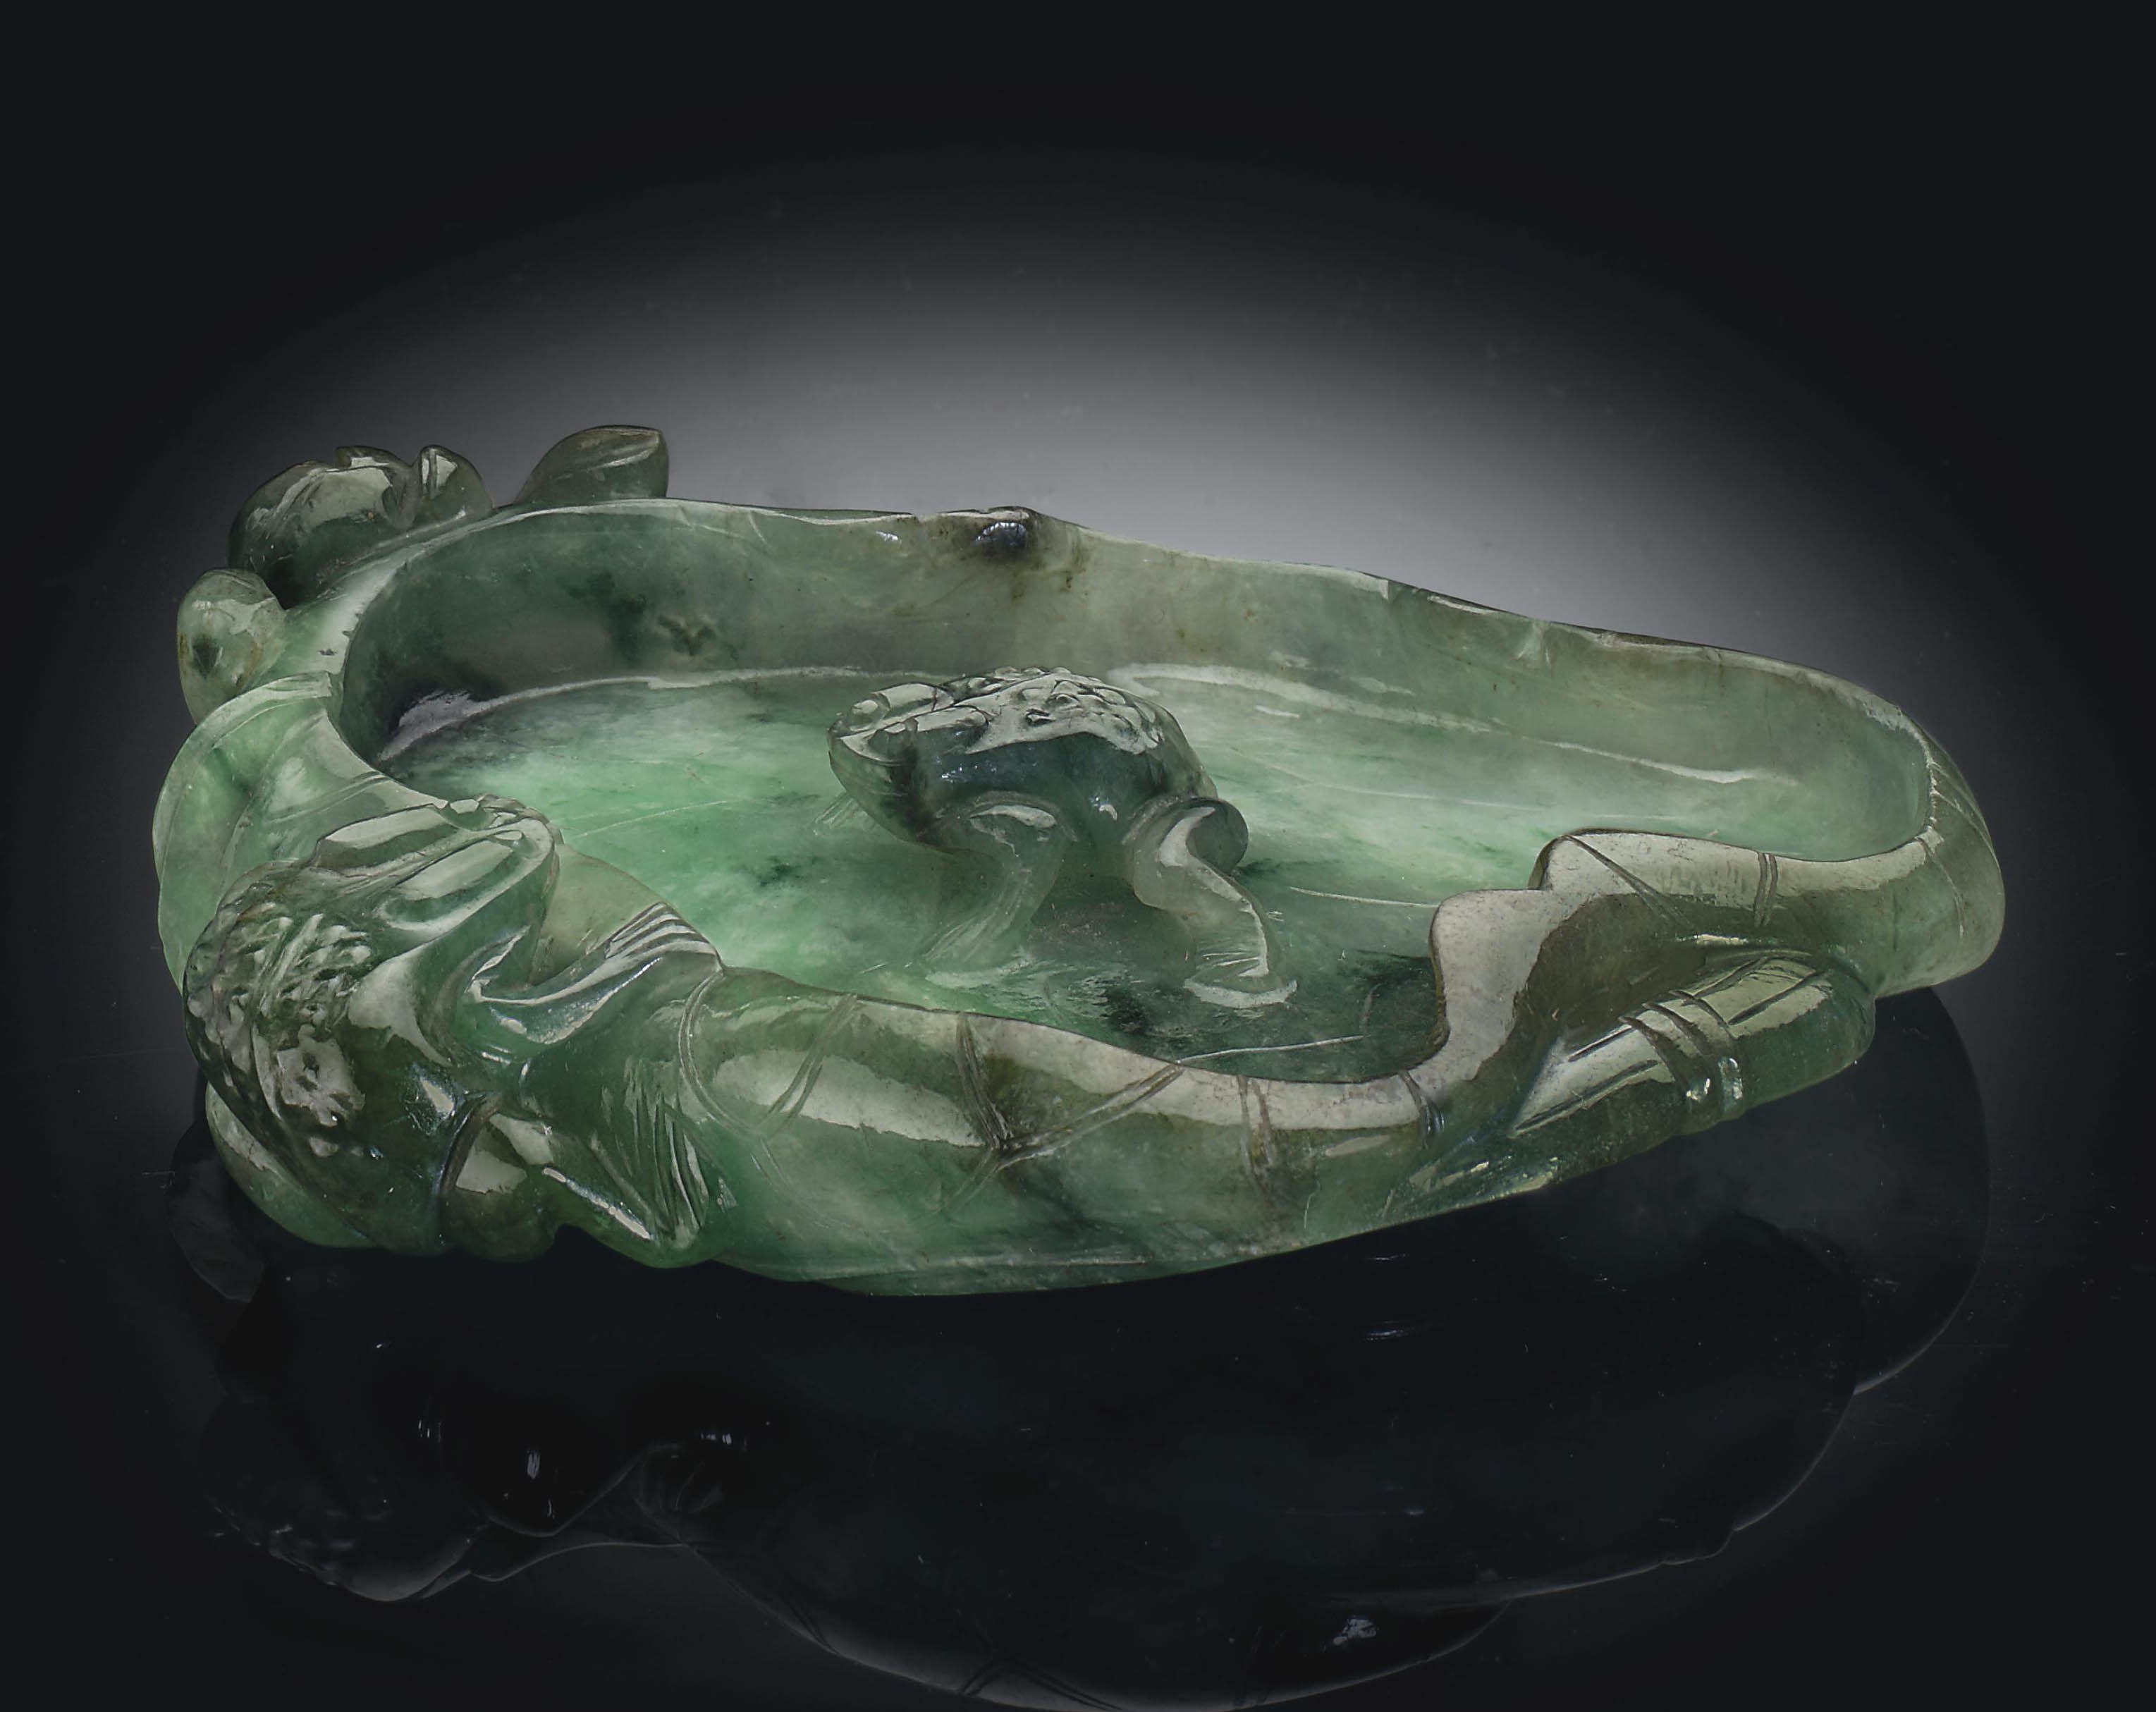 A SMALL MOTTLED GREEN JADEITE